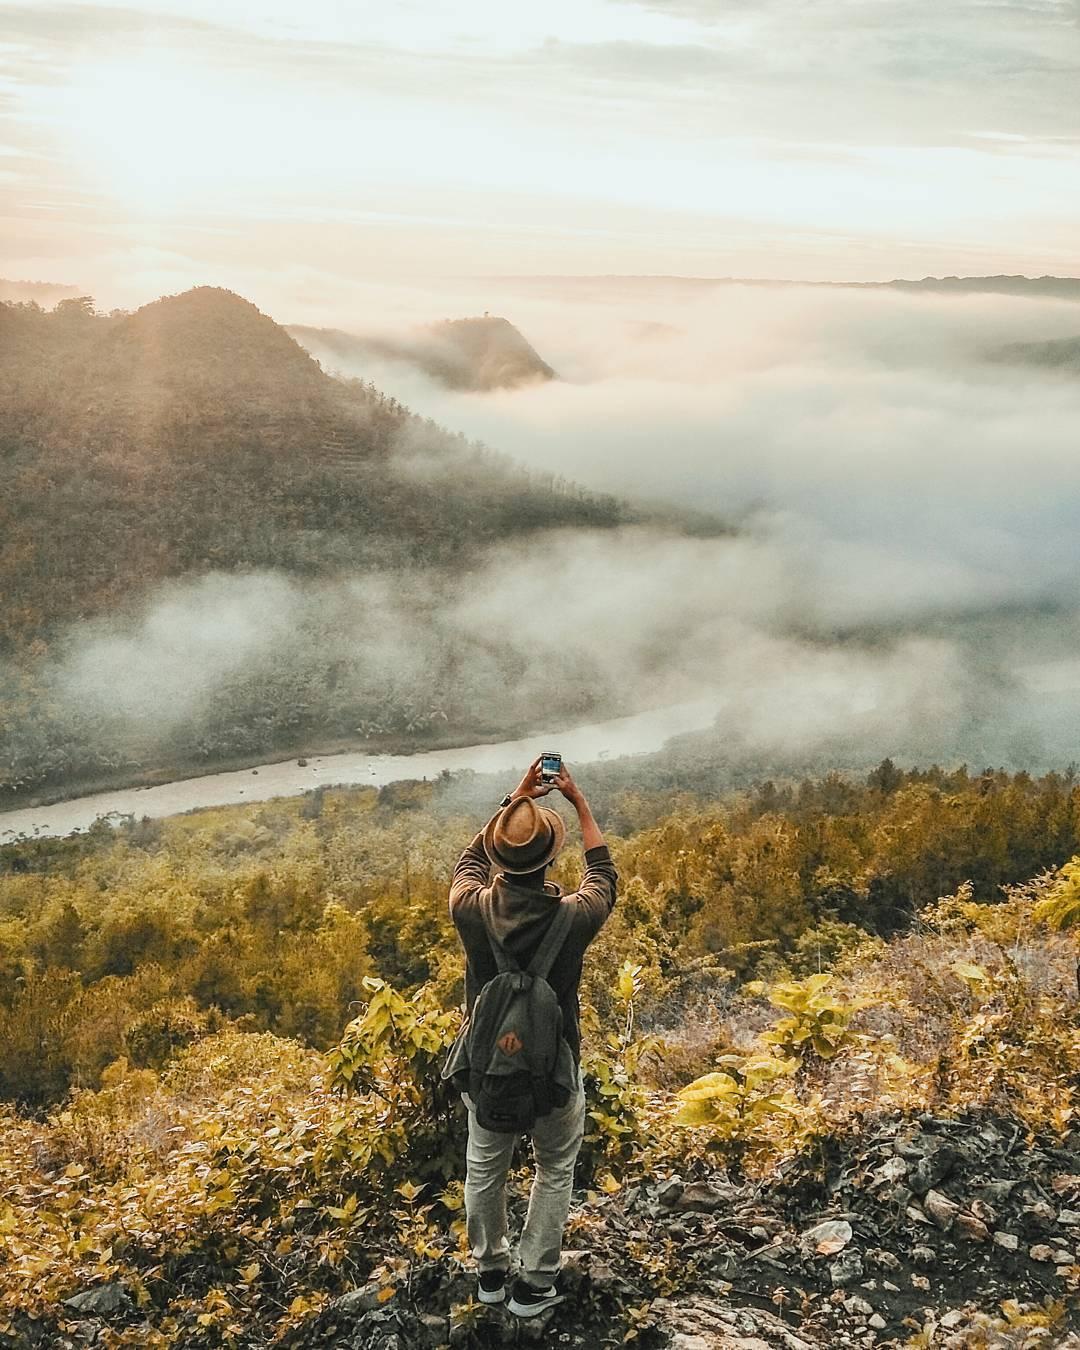 Bukit Panguk Kediwung, Bukit Panguk Kediwung Yogyakarta, Yogyakarta, Dolan Dolen, Dolaners Bukit Panguk Kediwung via algi alfahri - Dolan Dolen